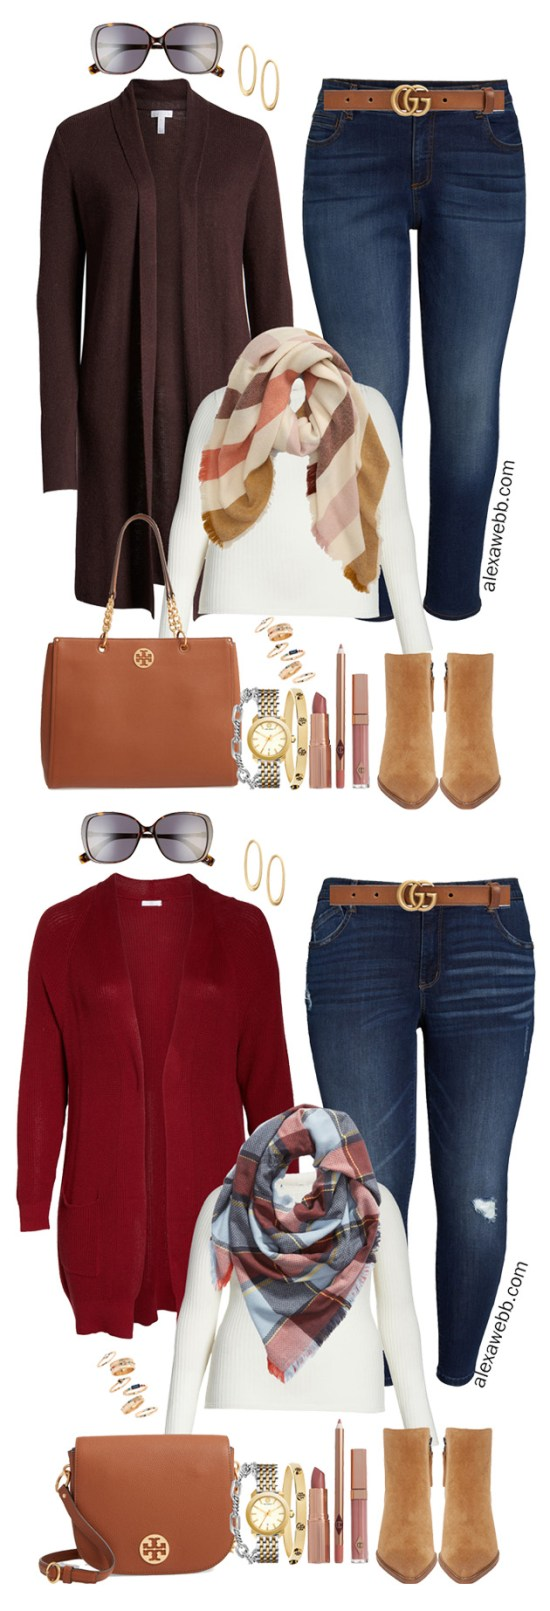 Nordstrom Anniversary Sale 2019 – Plus Size Outfits - Plus Size Burgundy Cardigan, Blanket Scarf, Dark Skinny Jeans, T-Shirt, Tote Bag, Ankle Booties - alexawebb.com #plussize #alexawebb